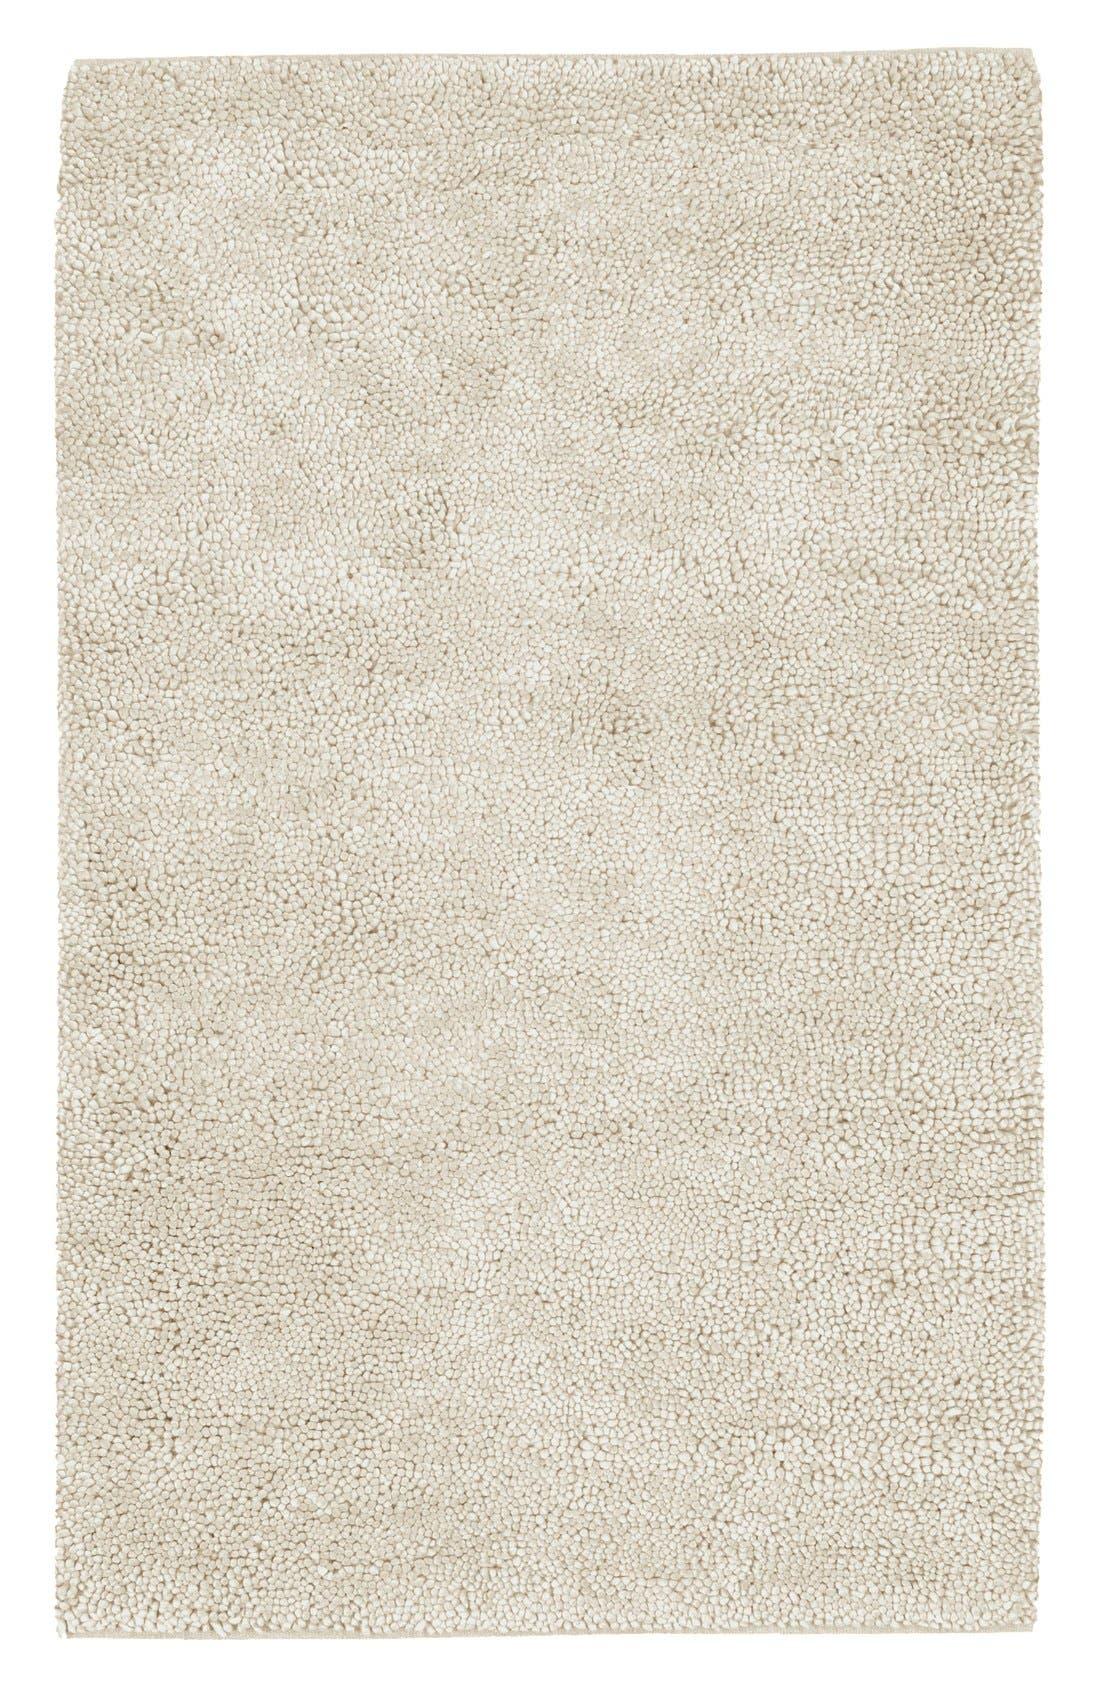 'Aros' Wool Rug,                         Main,                         color, IVORY